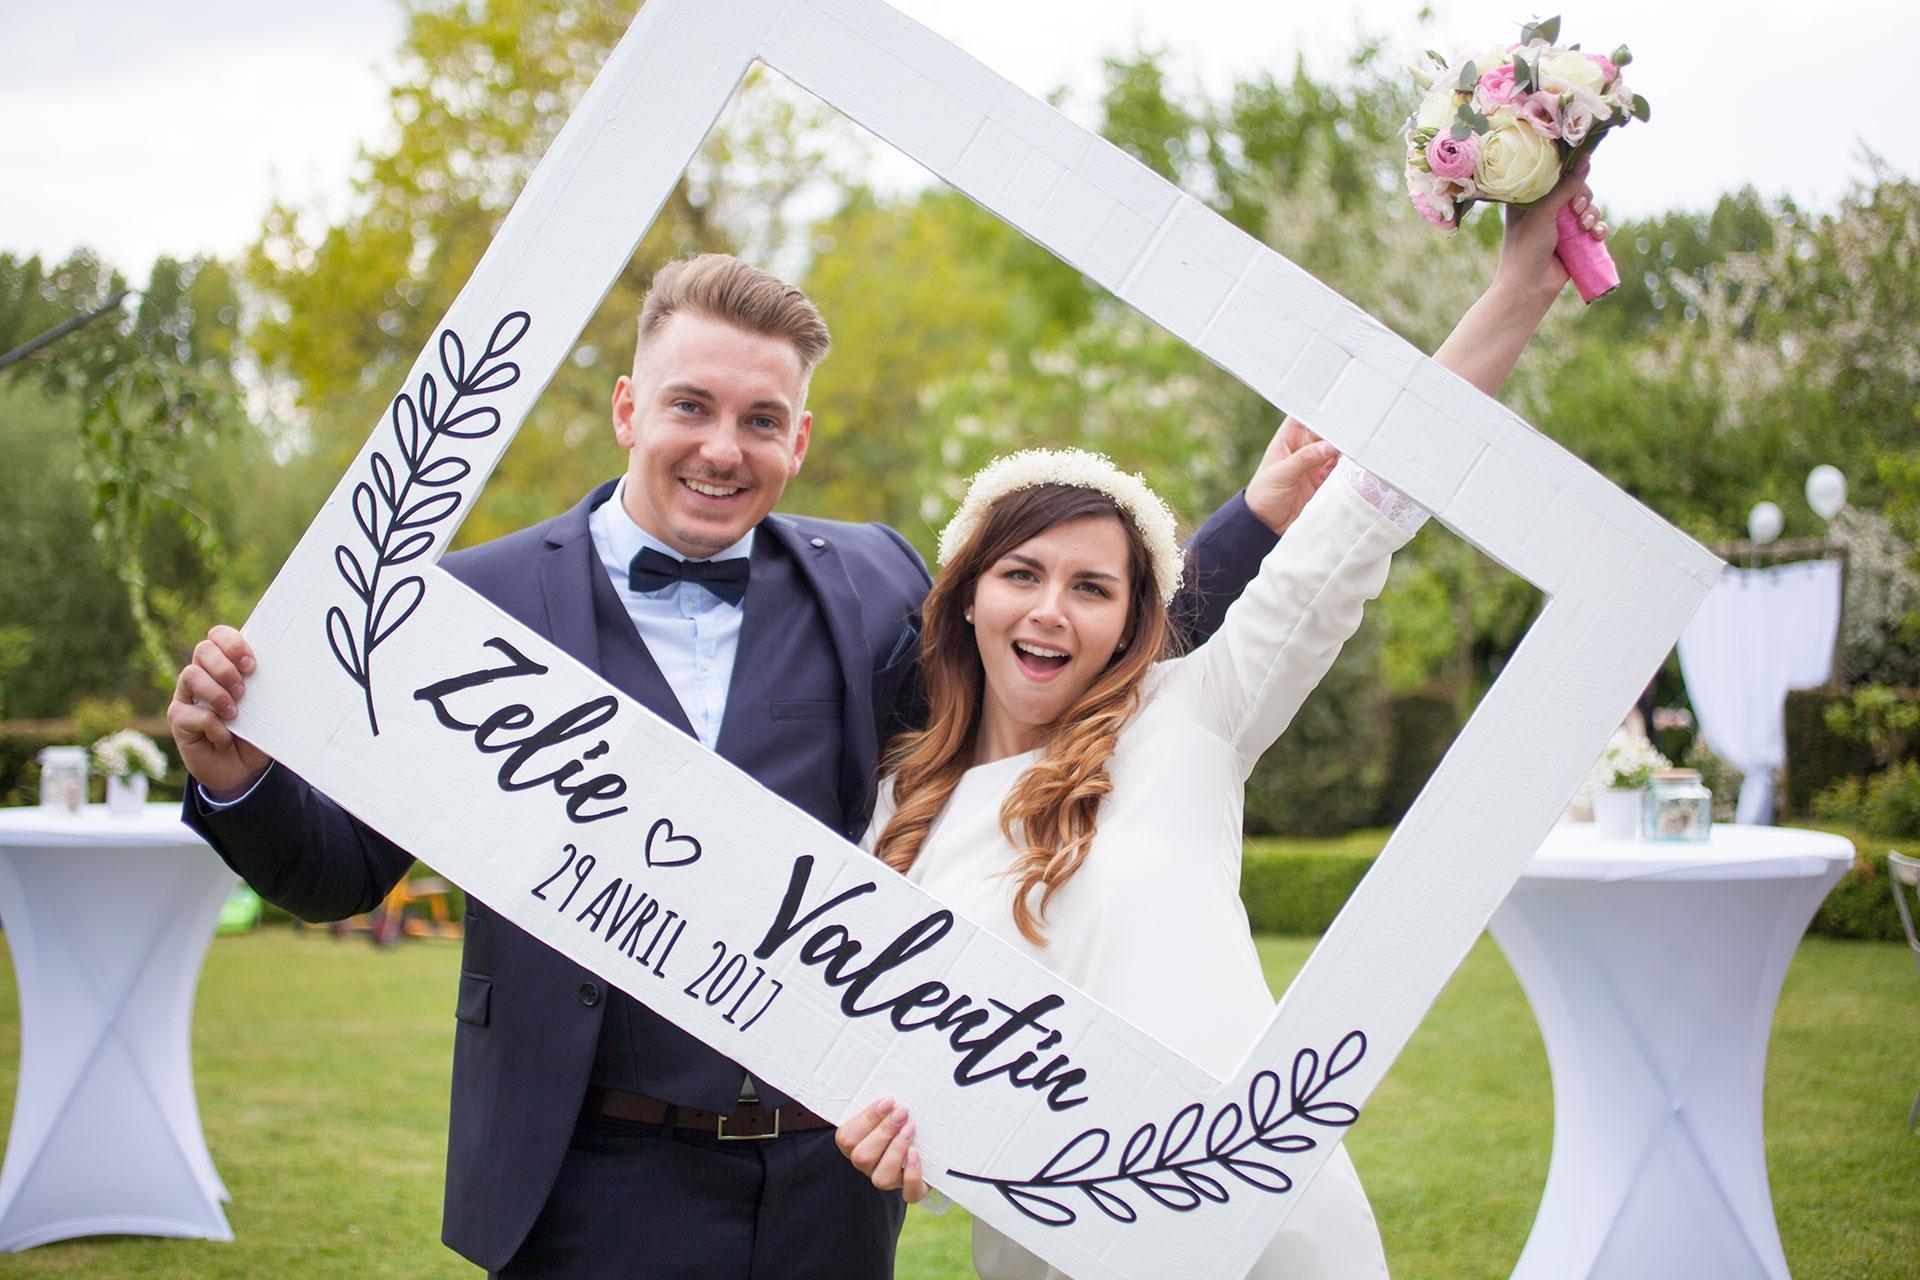 particuliers-evenements-mariages-oui-zelie&valentin-49